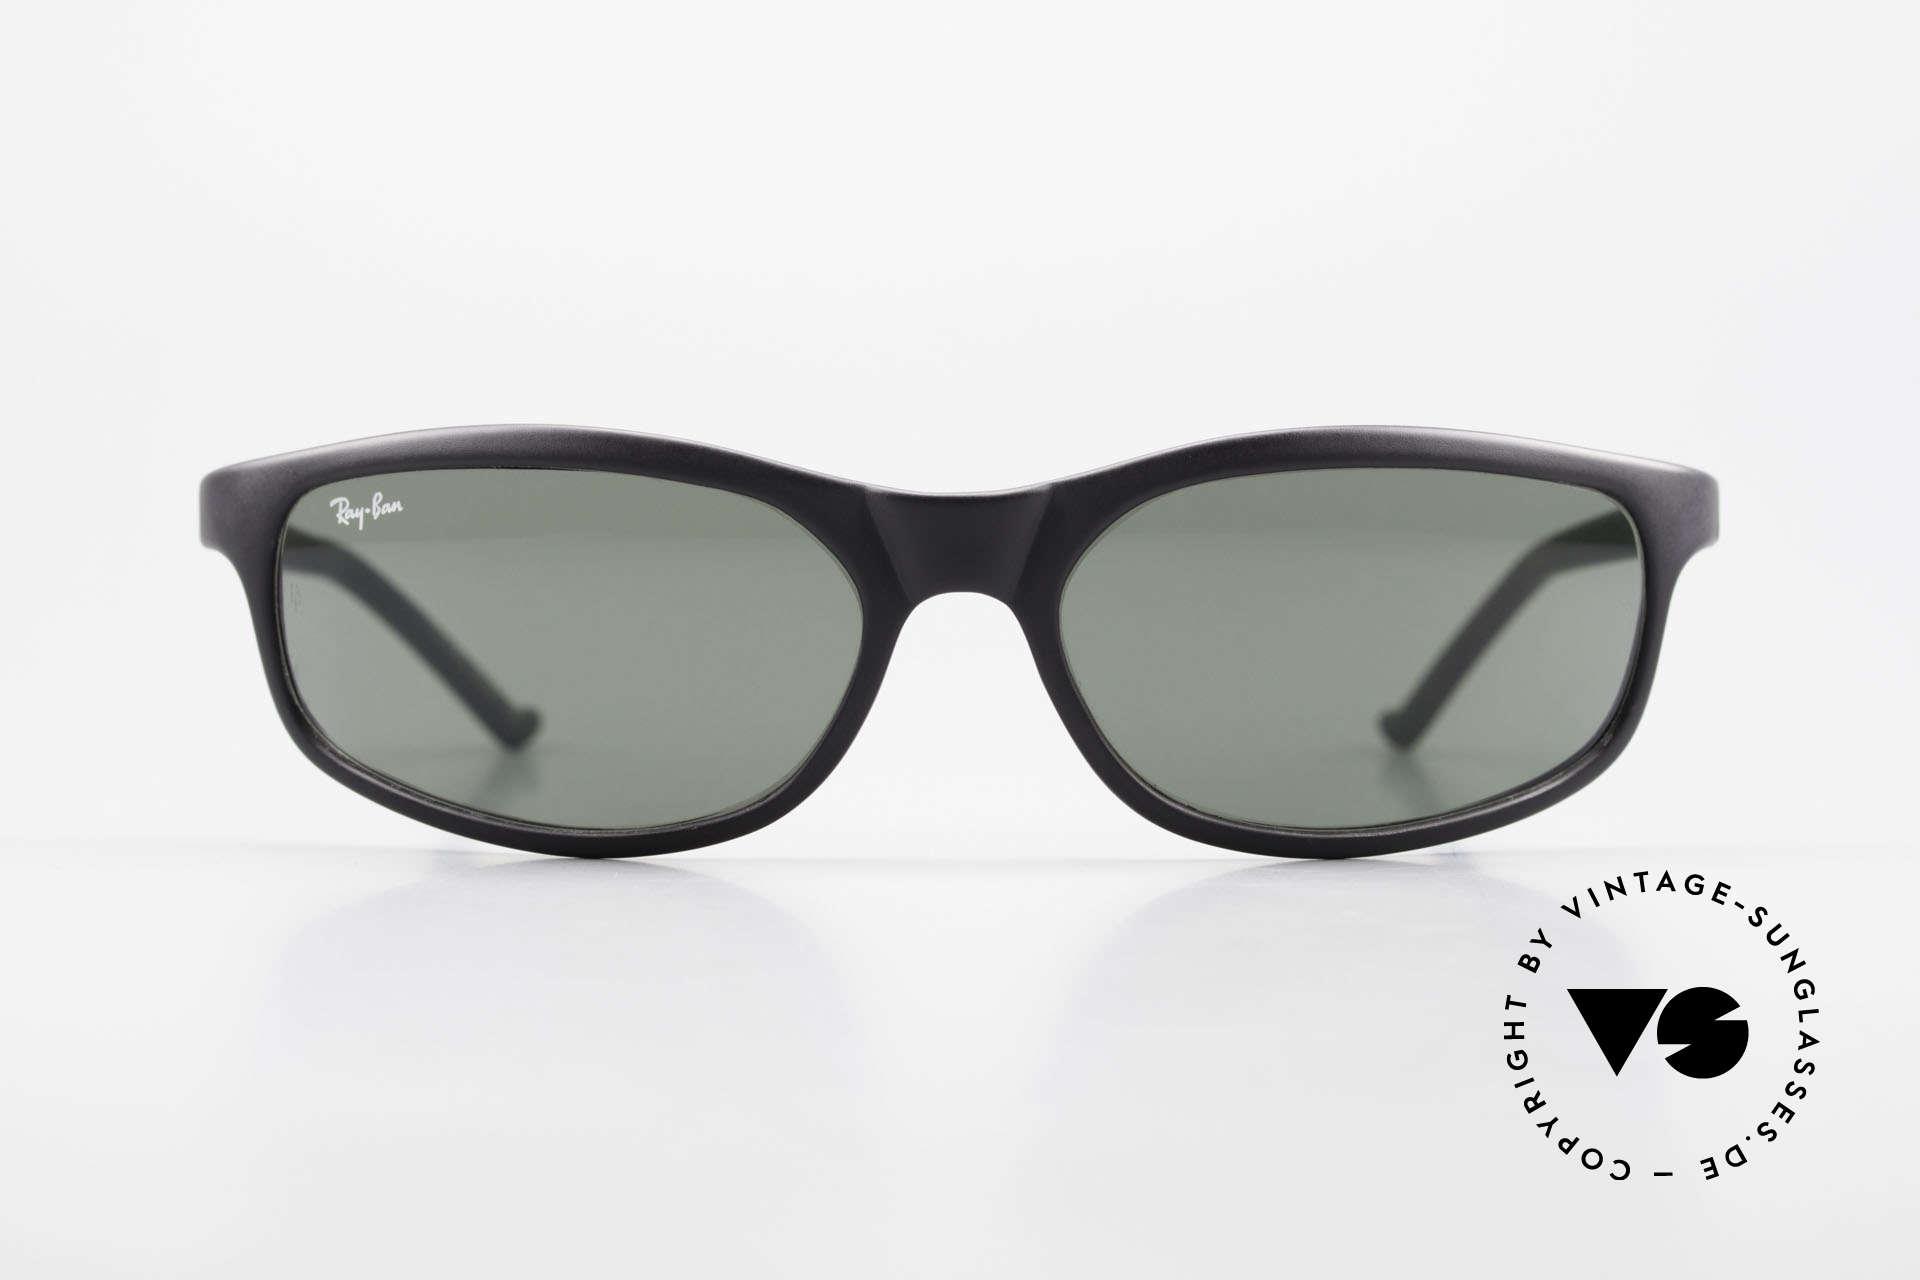 Ray Ban Predator 8 Sporty B&L USA Sunglasses, PREDATOR 8, dull black, G15 B&L lenses, 57mm, Made for Men